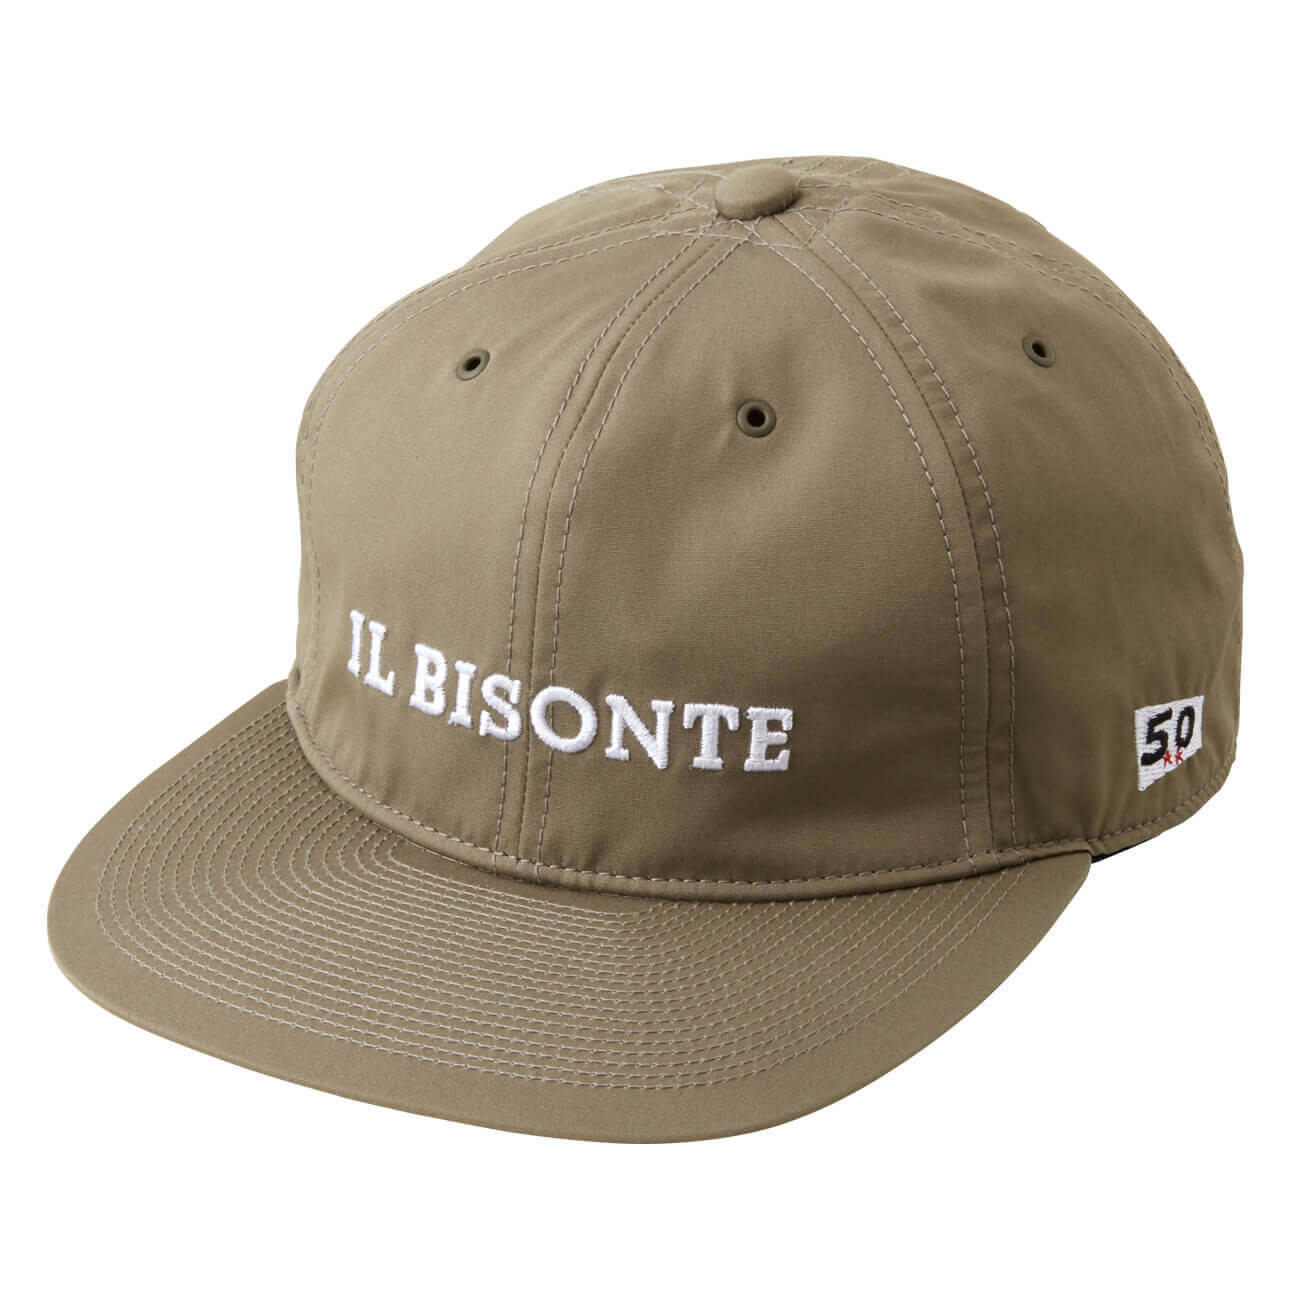 IL BISONTE (イル ビゾンテ) 日本公式オンラインストア キャップ 54202304483